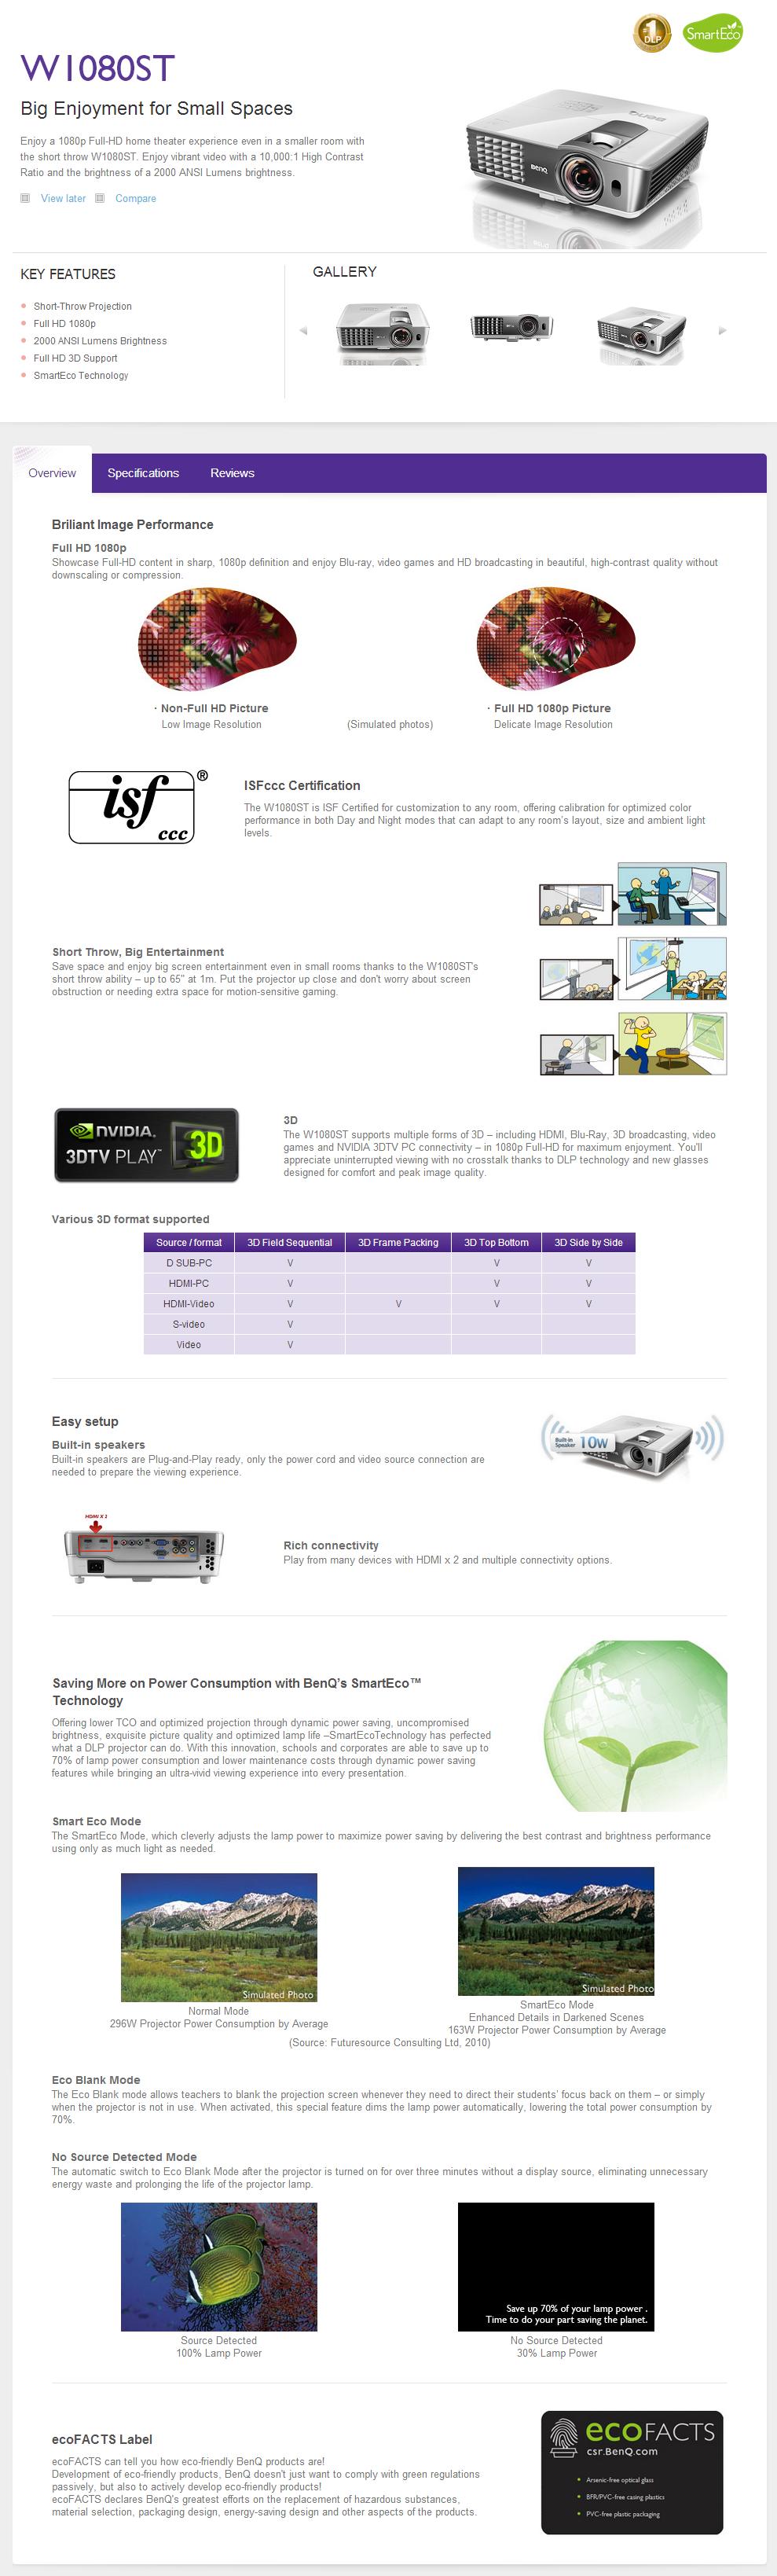 intro 01 BENQ Projectors W1080ST Review